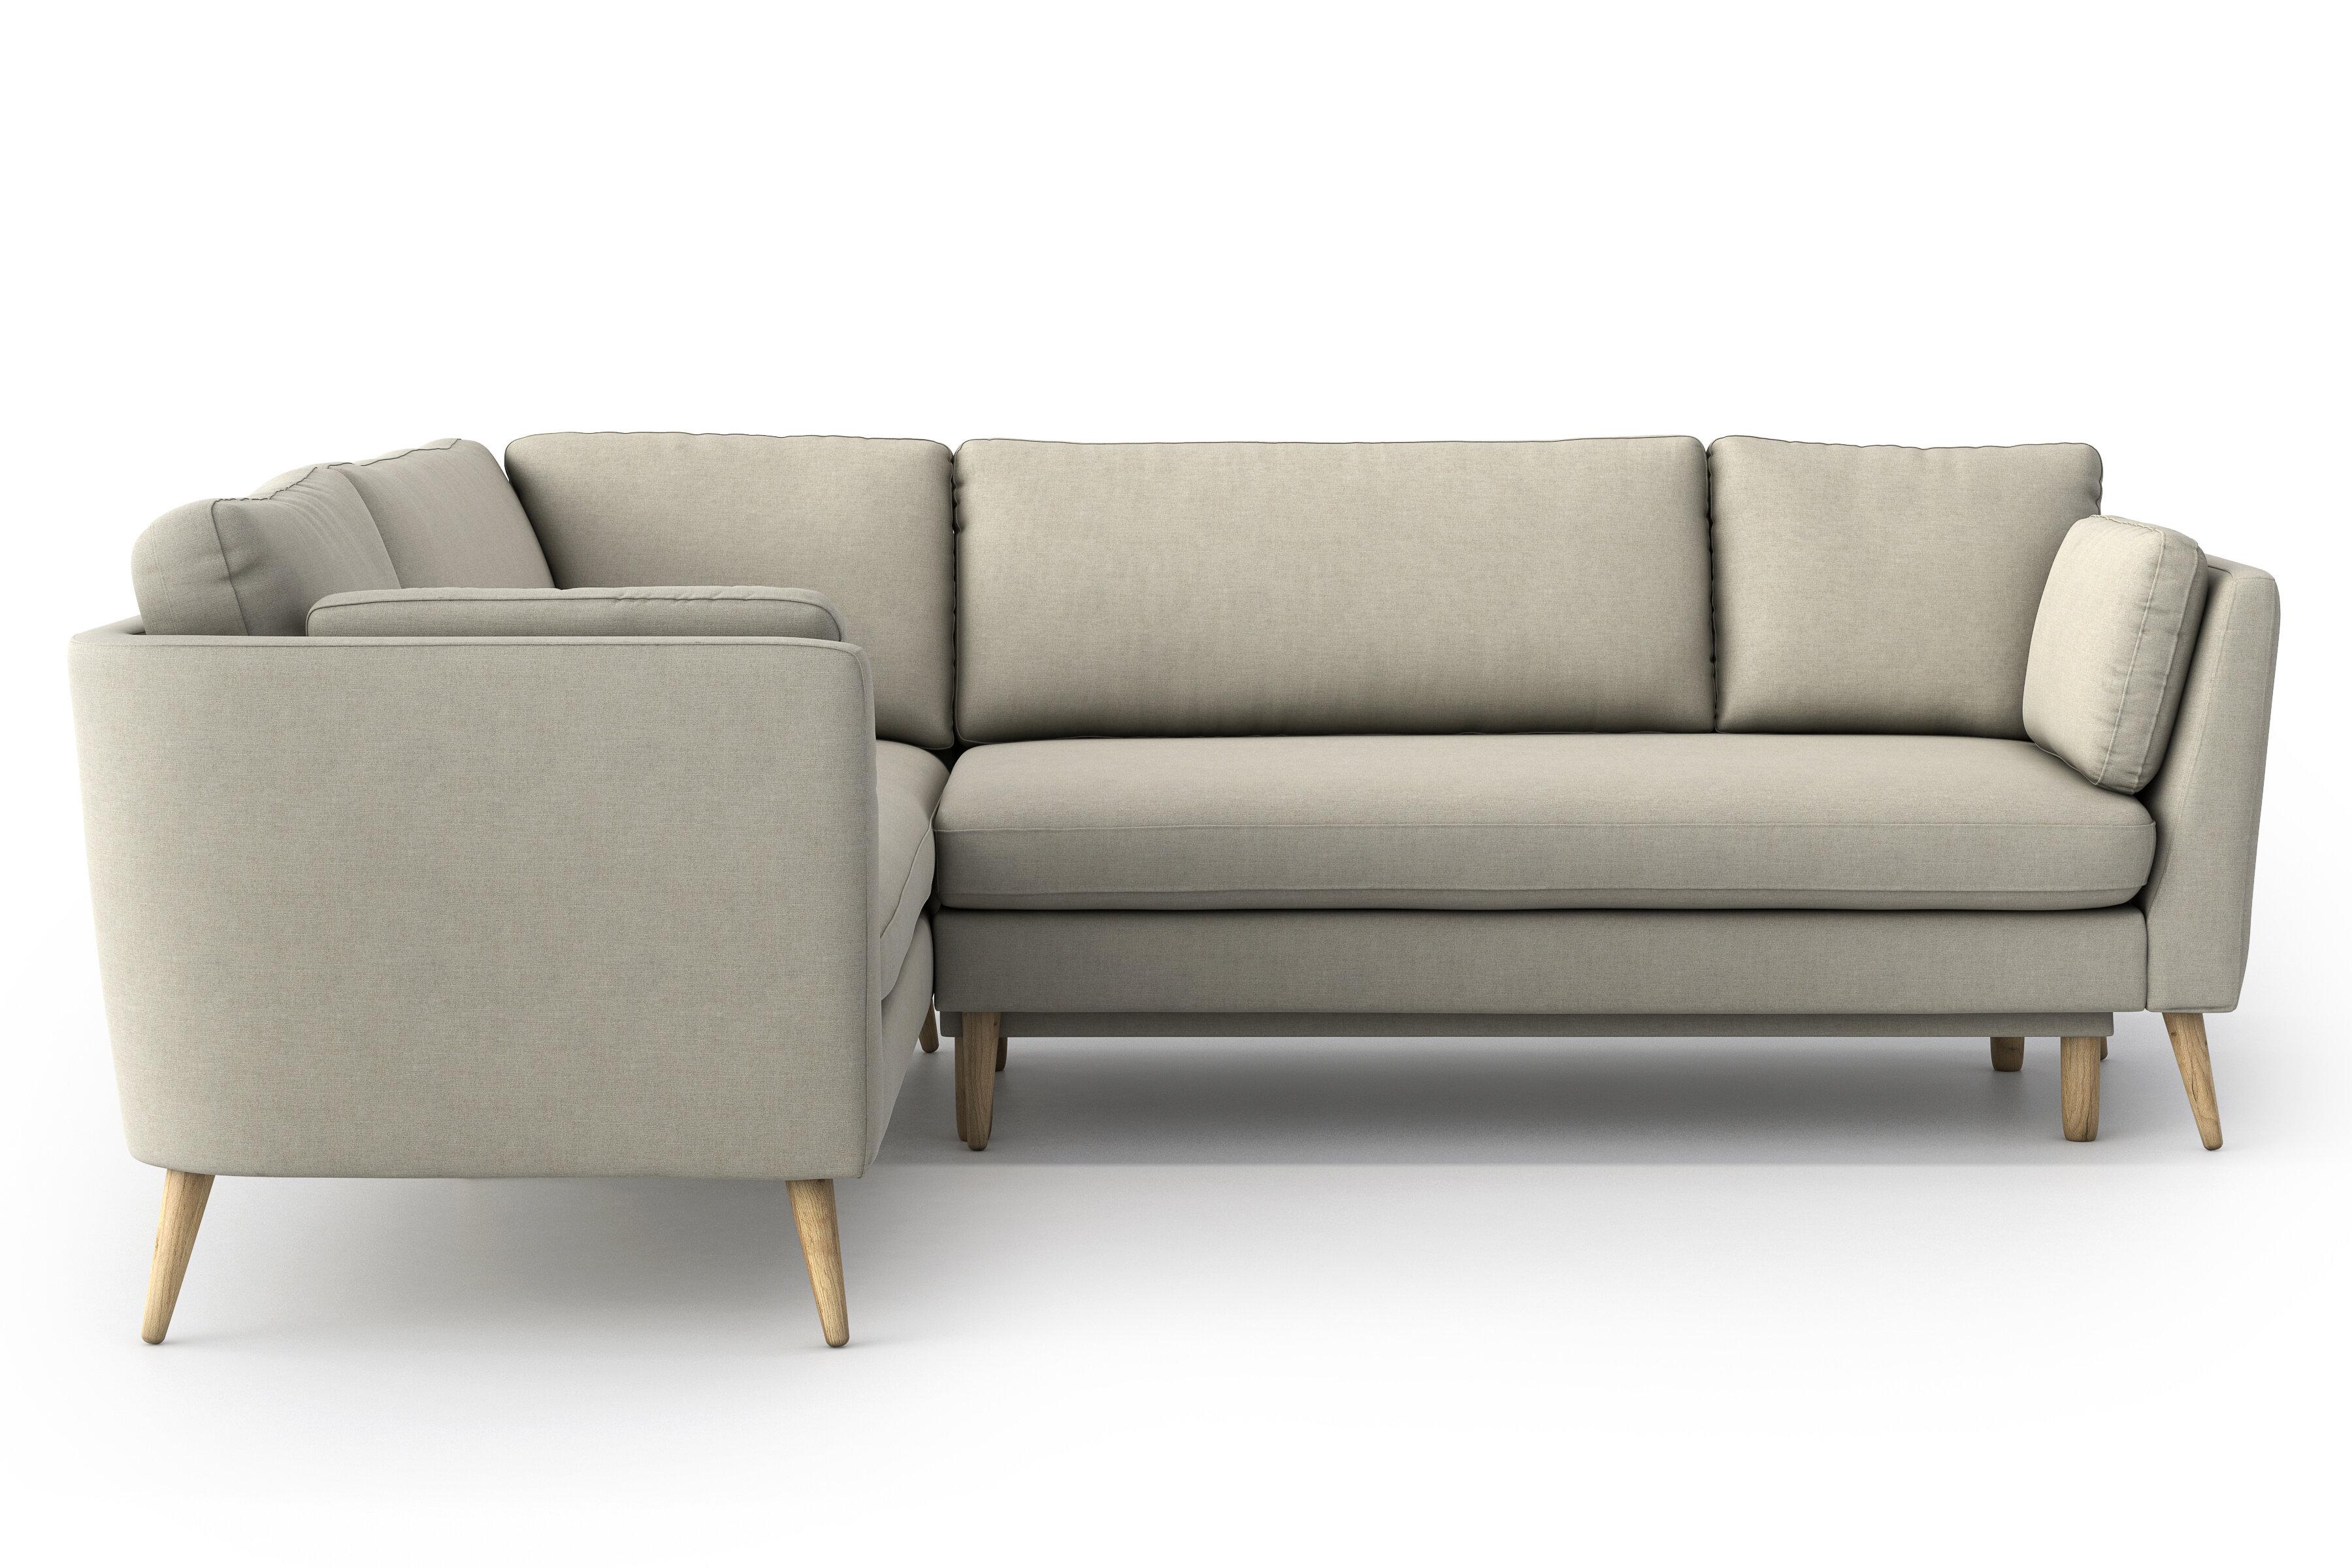 Holsey Sleeper Corner Sofa Bed